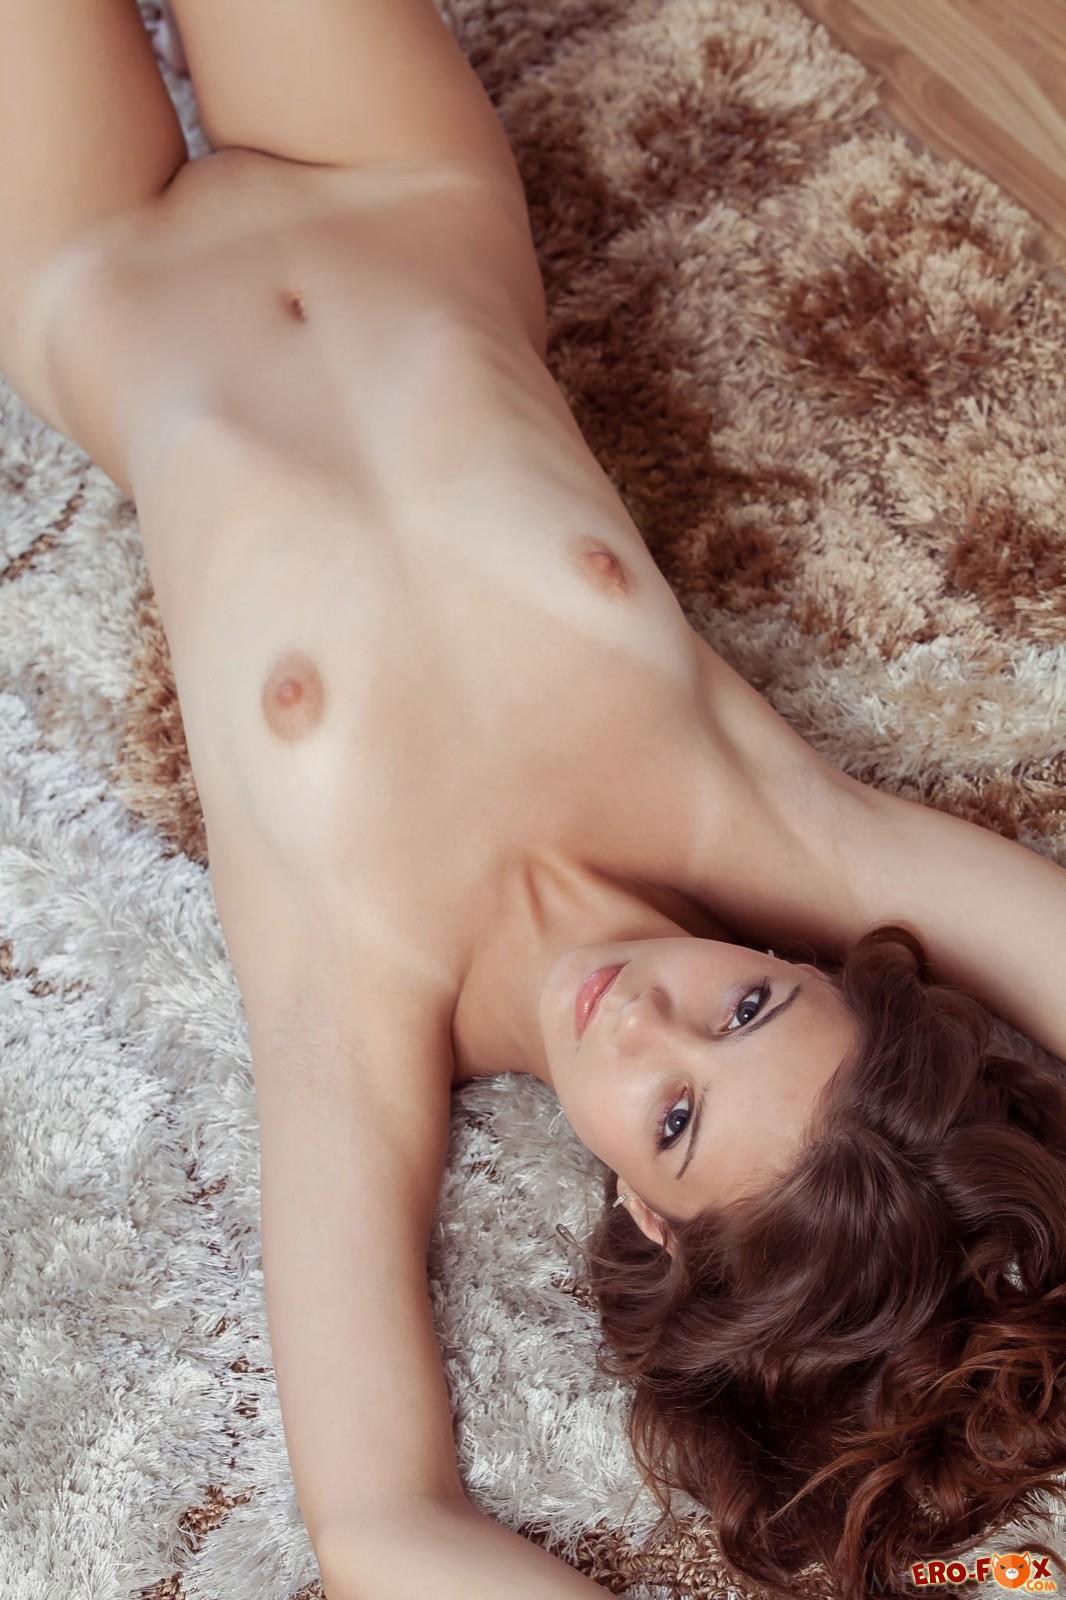 Обнаженная красавица с маленькой грудью